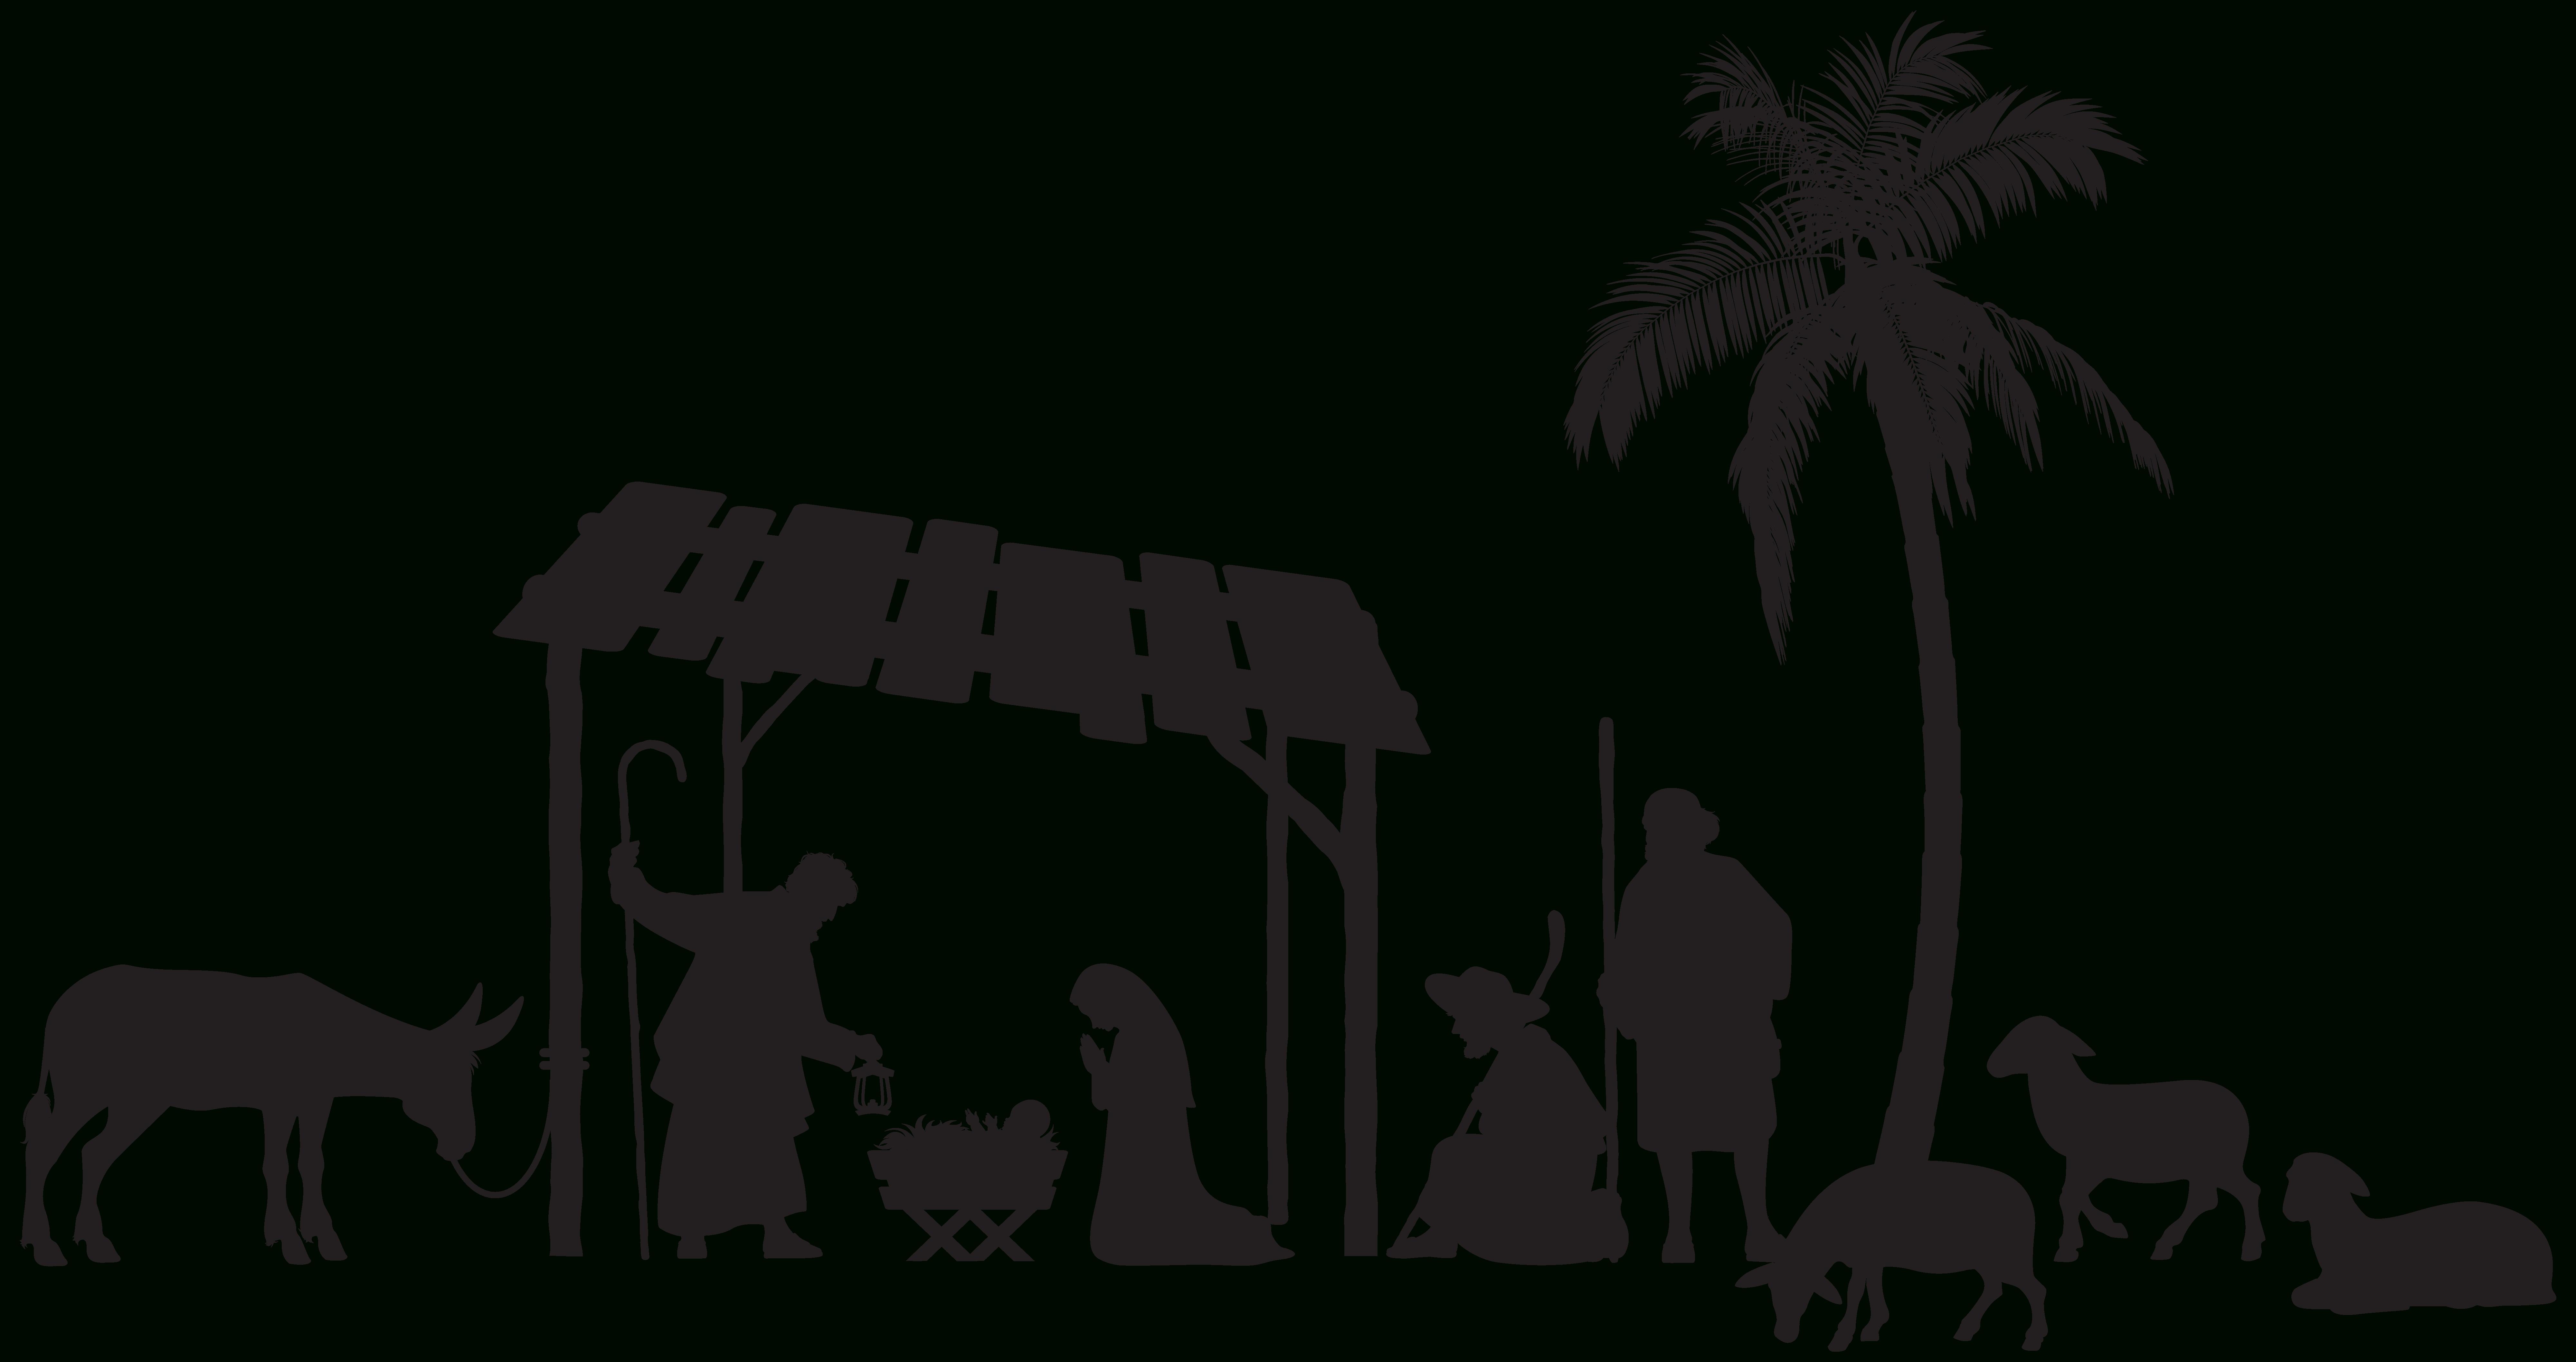 Pinalonso Cornejo On Figuras De Madera   Nativity Scene Pictures - Free Printable Nativity Silhouette